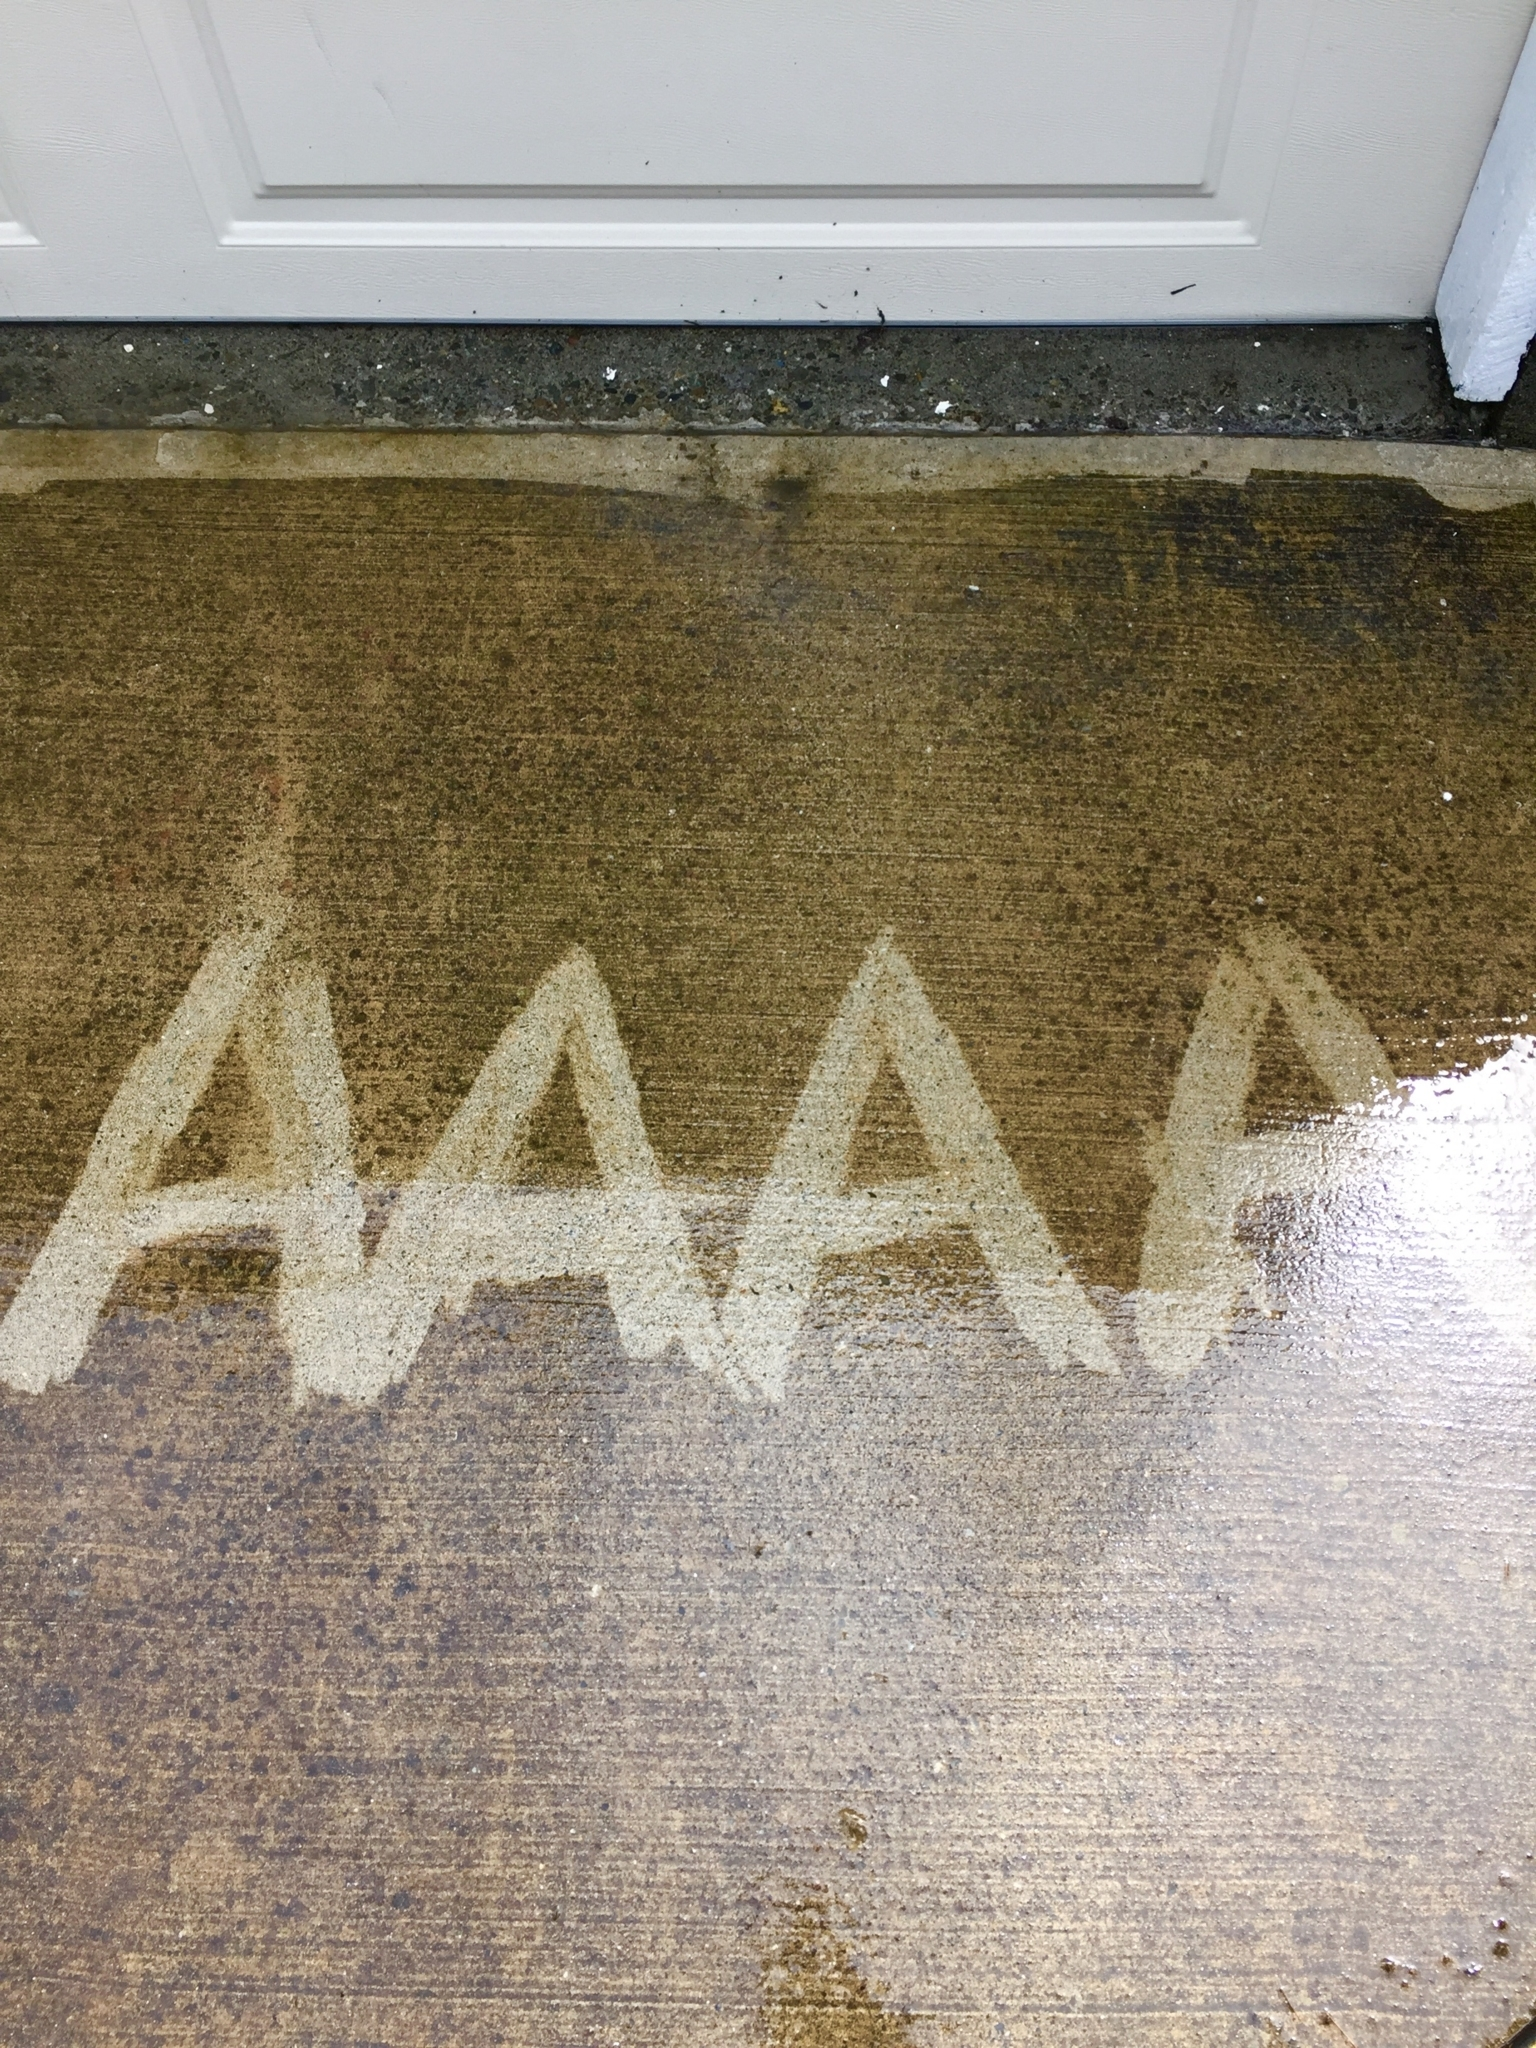 AAAA Pressure Washing Services